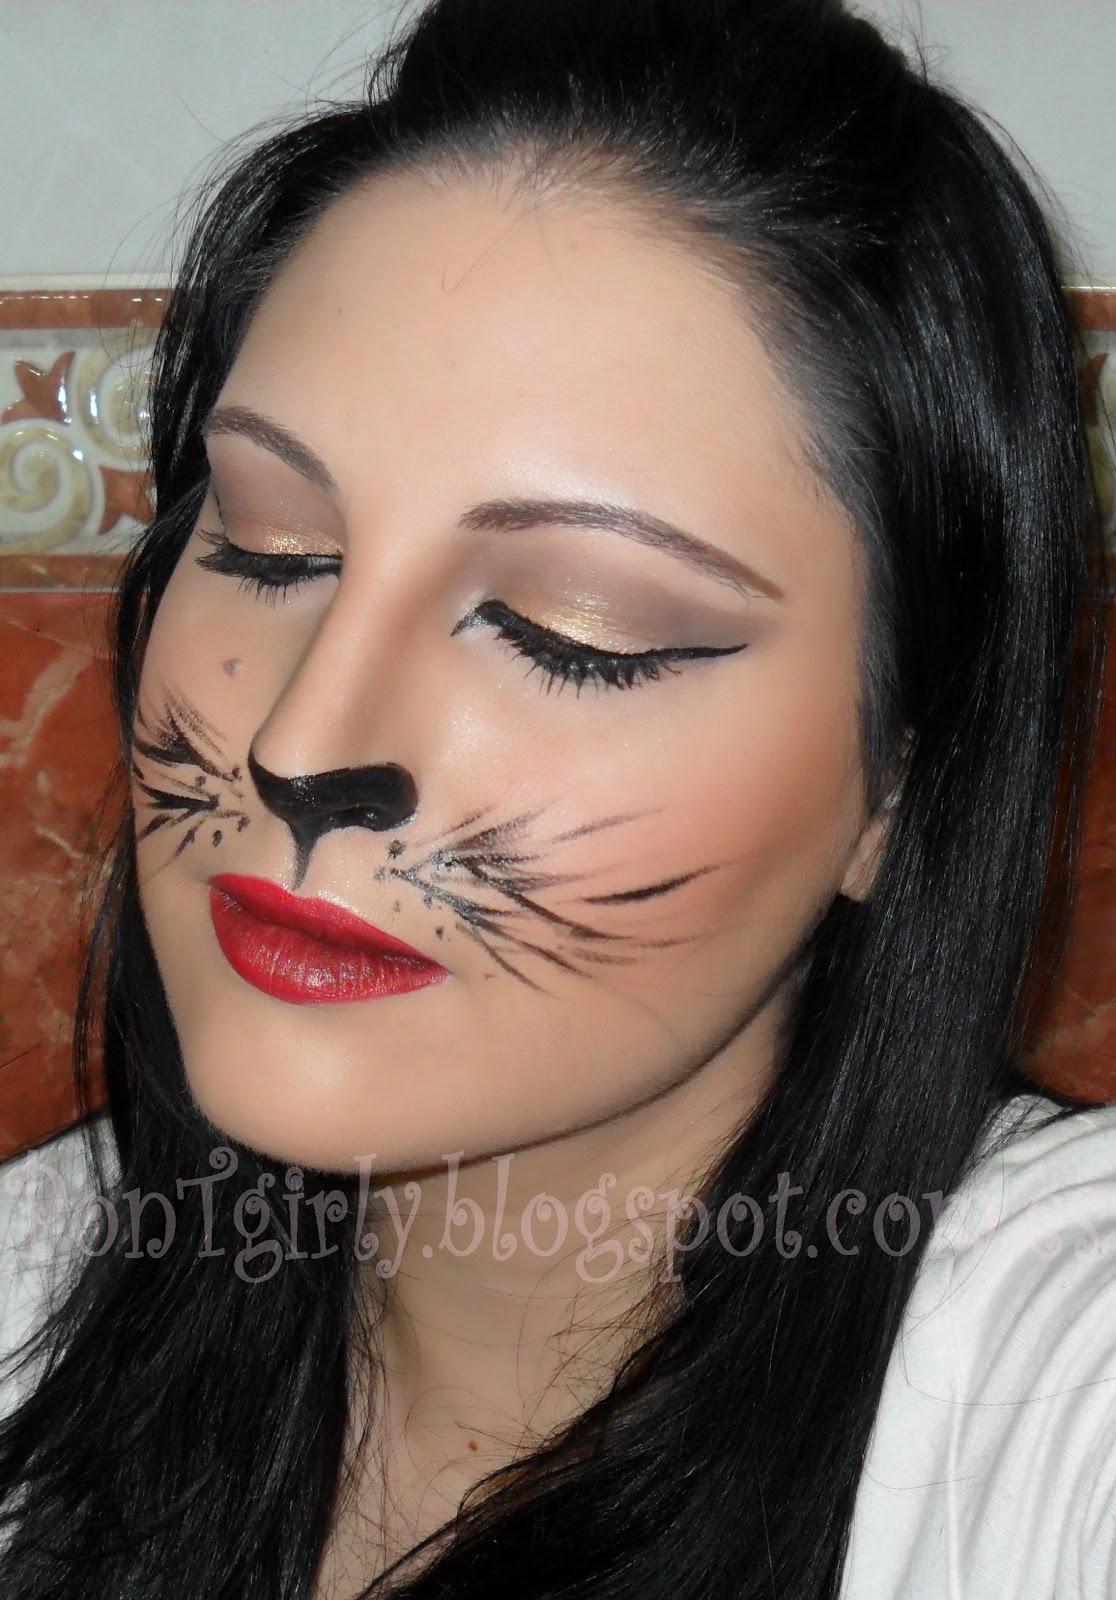 maquillage halloween facile